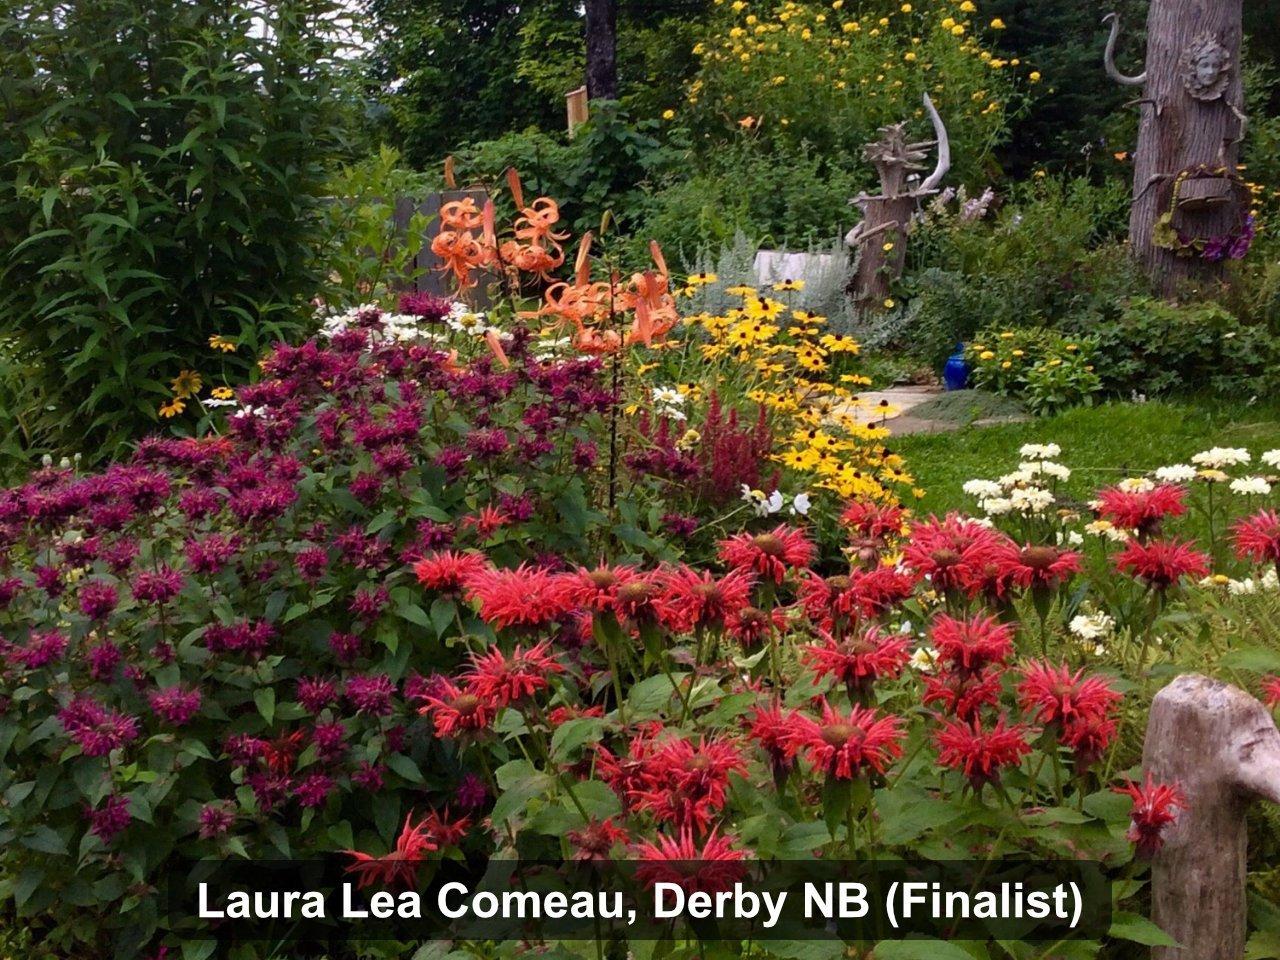 Finalist - Laura Lea Comeau, Derby NB